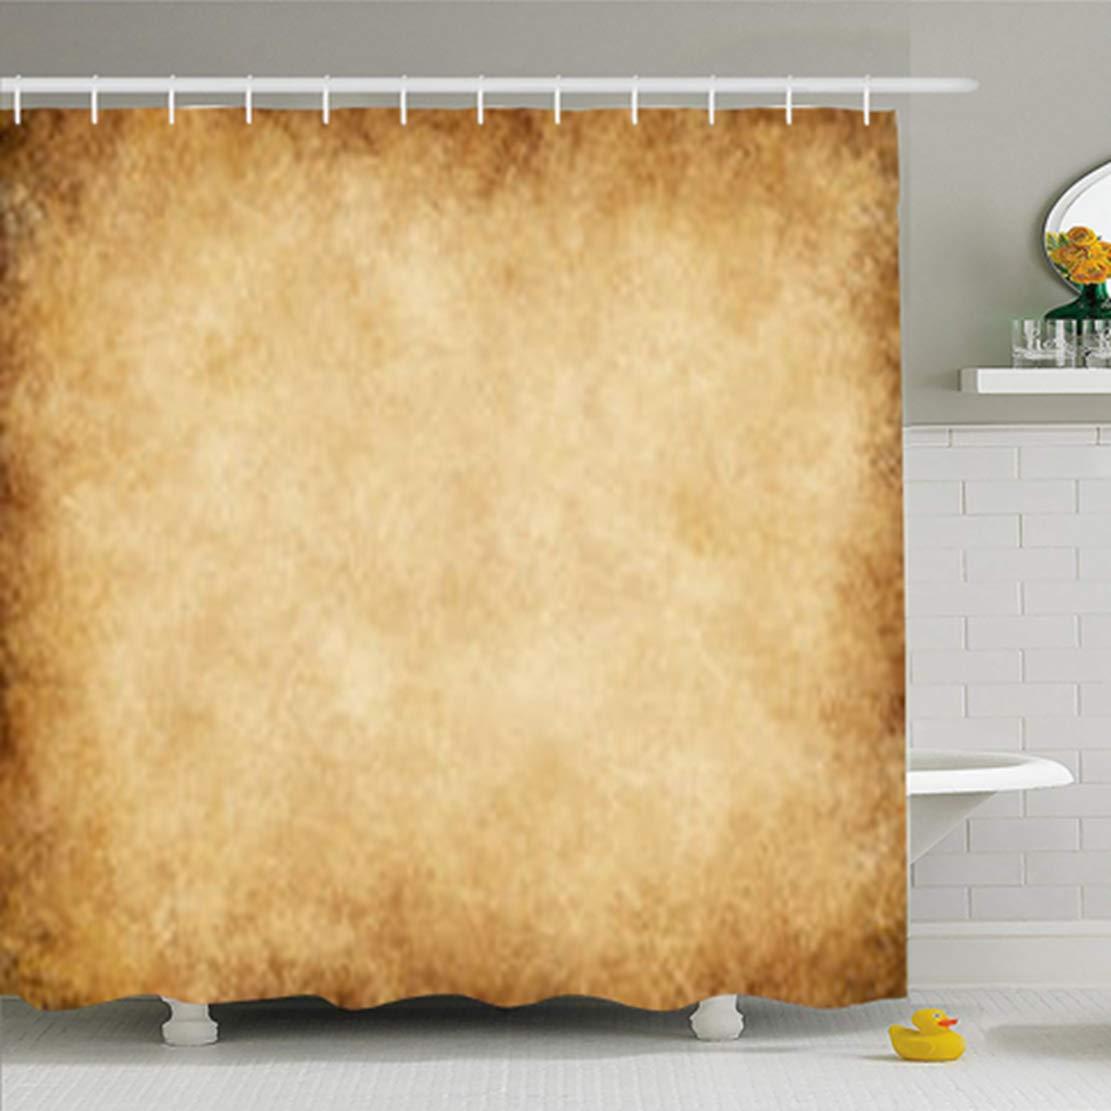 InnoDIY Shower Curtains Bathroom 66 x 72 Inches Purple Pastel Pink Pale Simple Vintage Color Waterproof Home Decor Bath Set Hooks